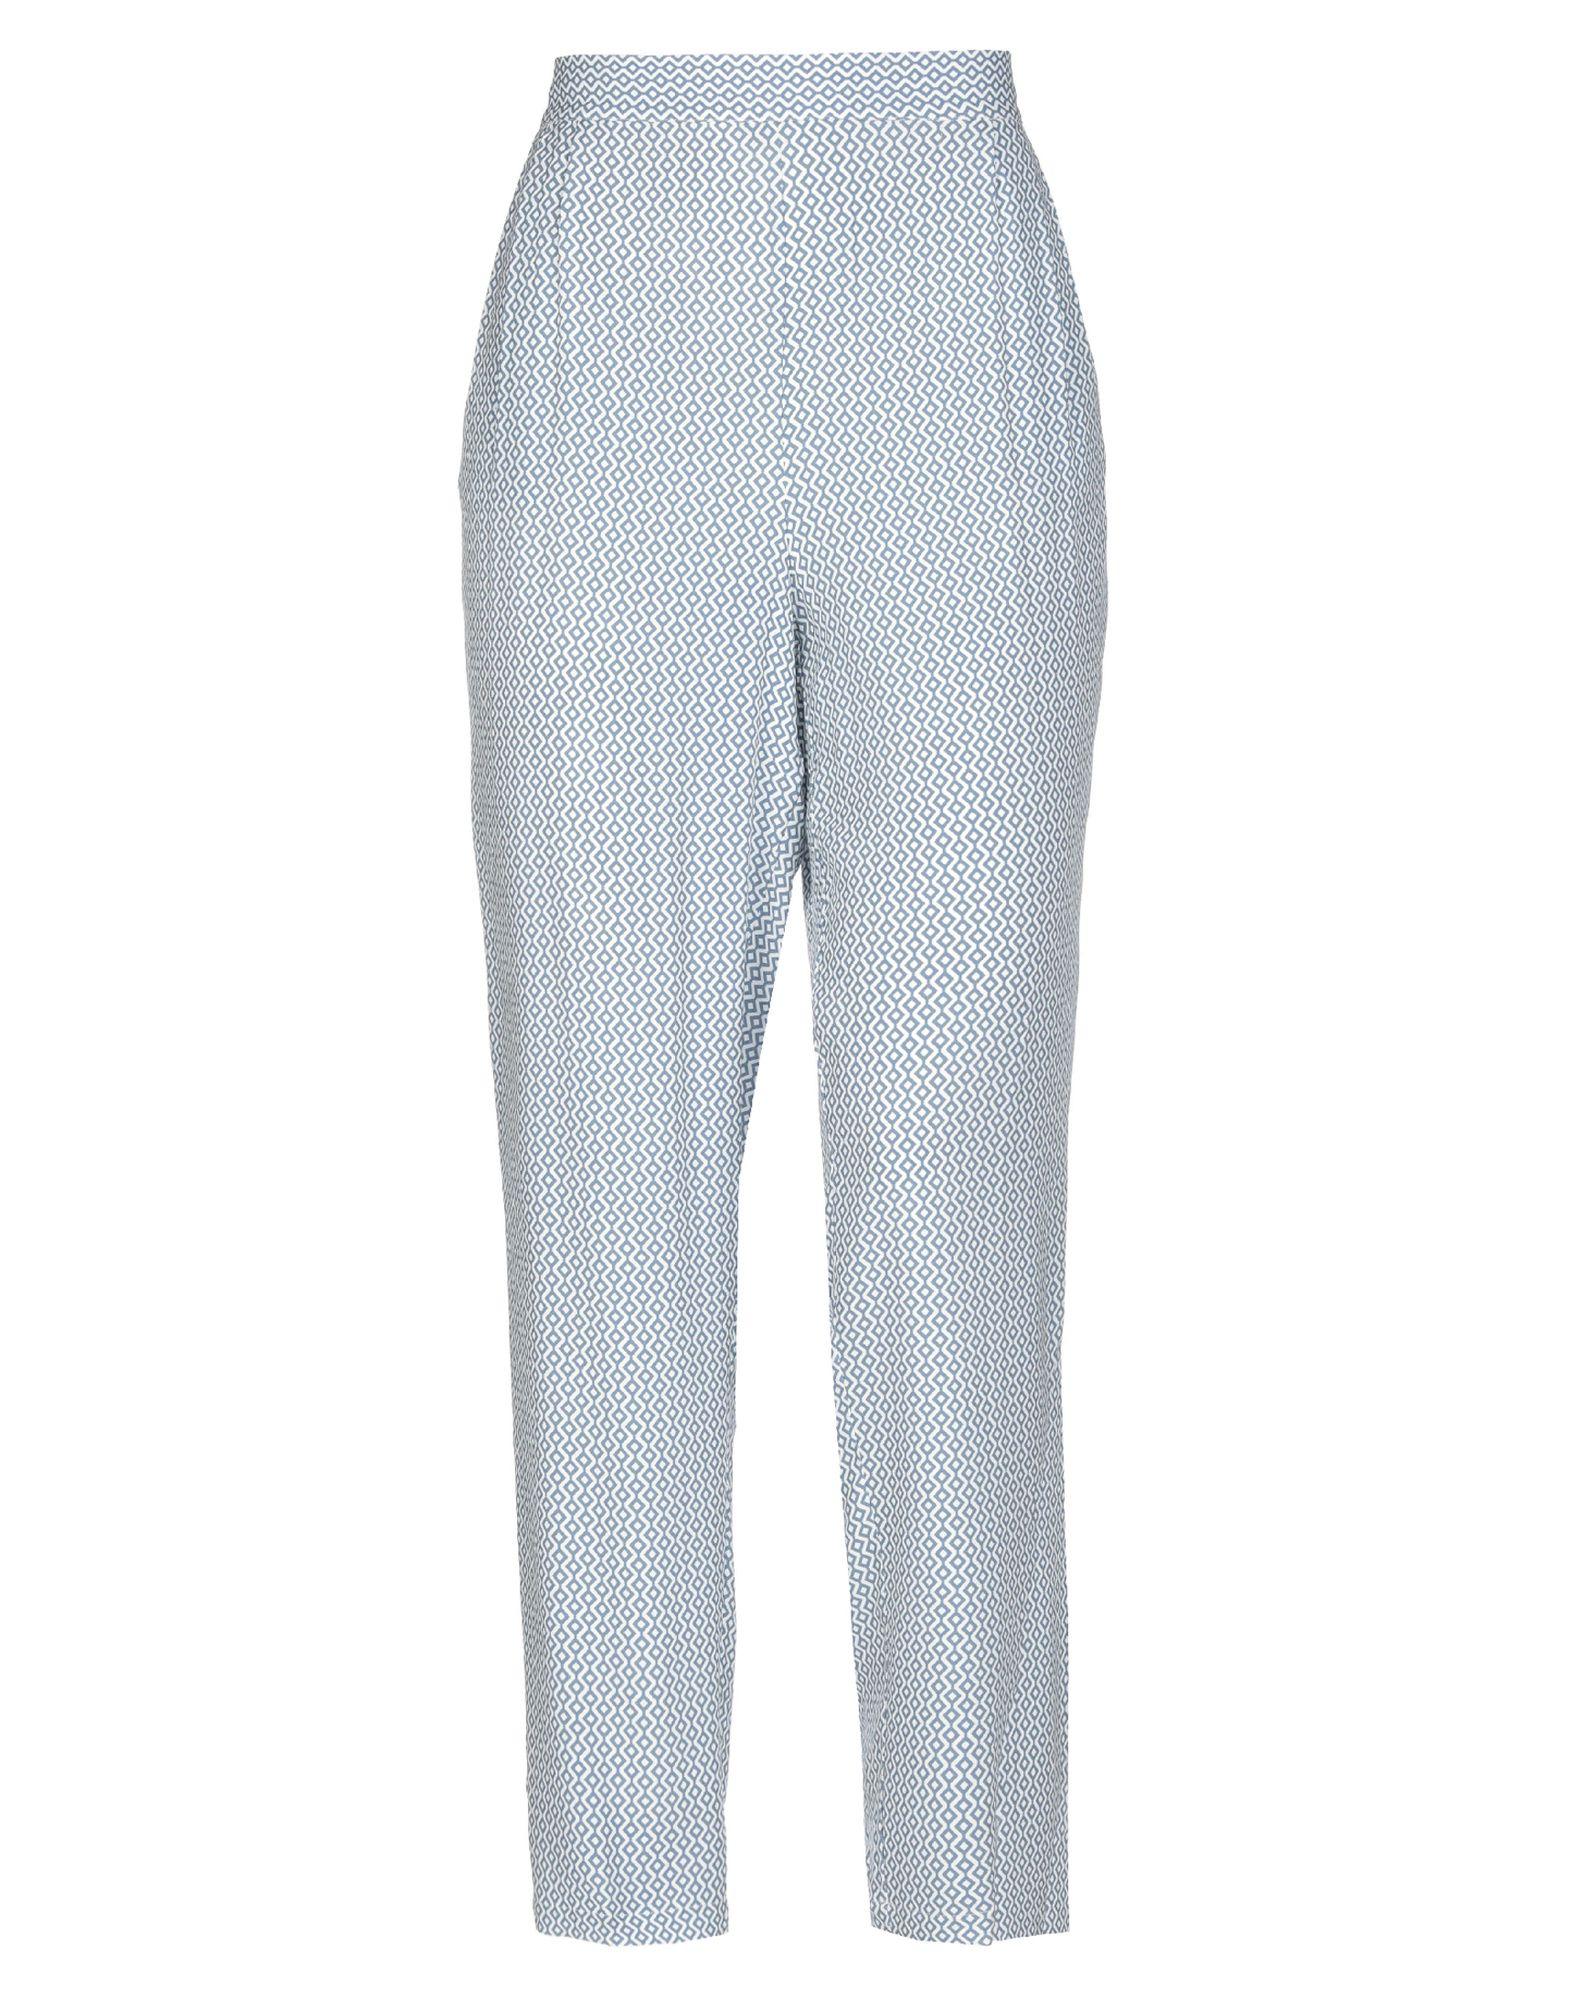 BLU BIANCO Повседневные брюки blu bianco водолазки